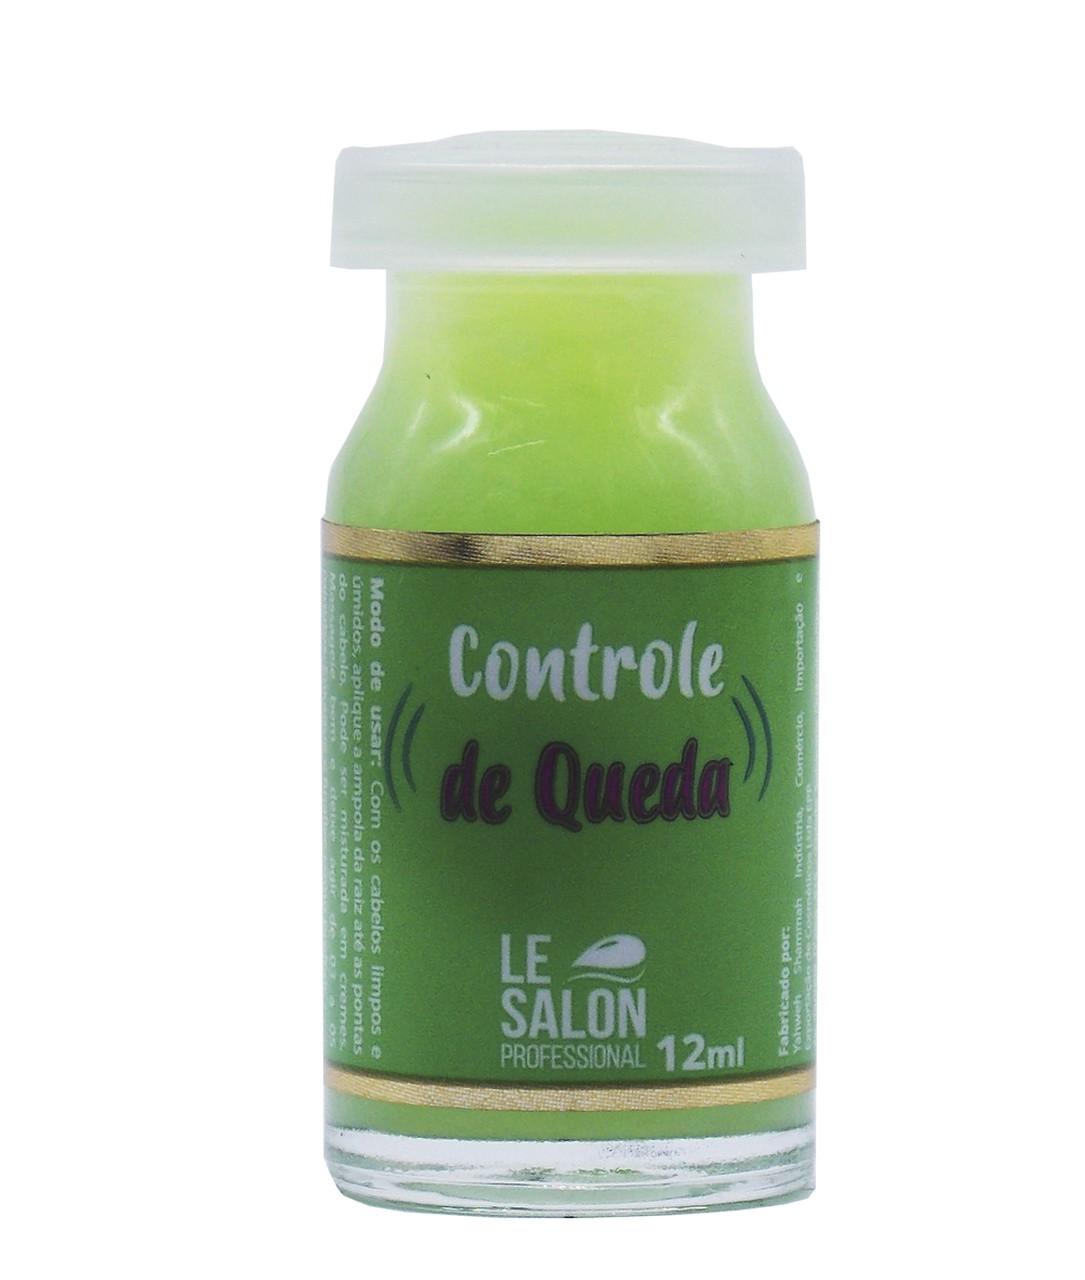 CONTROLE DE QUEDA AMPOLA LE SALON - KIT C/ 3 UNIDADES